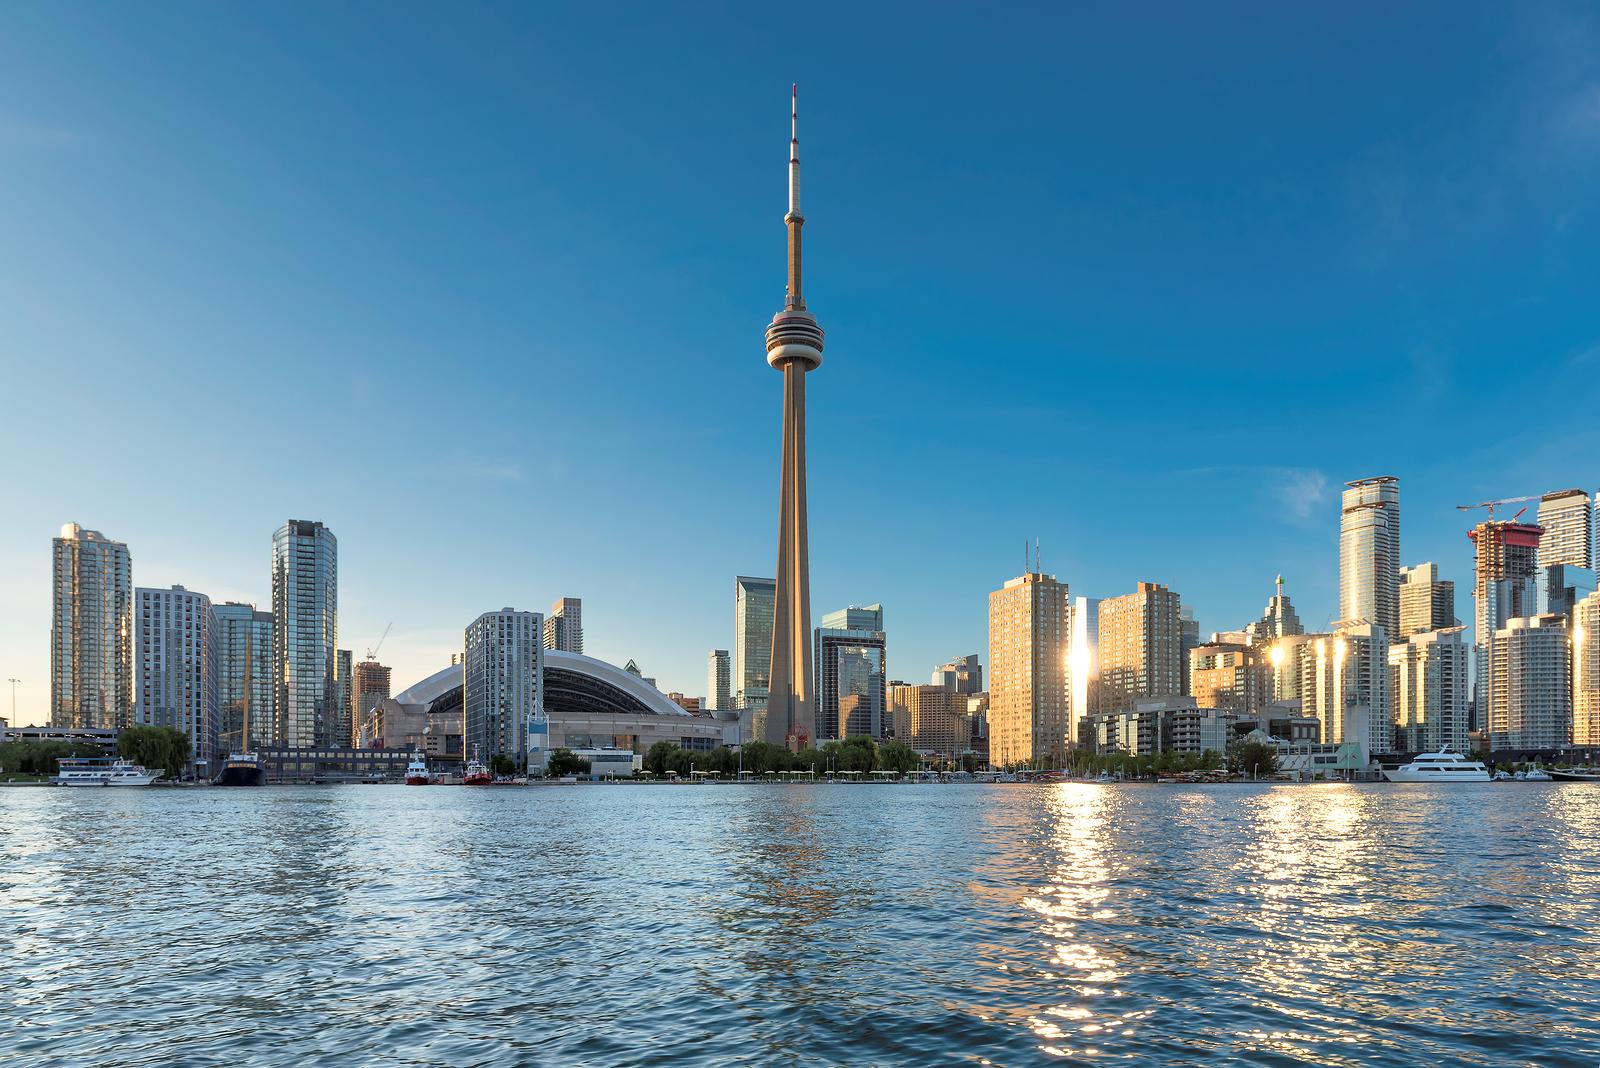 bigstock-Toronto-Skyline-At-Beautiful-S-237030436.jpg